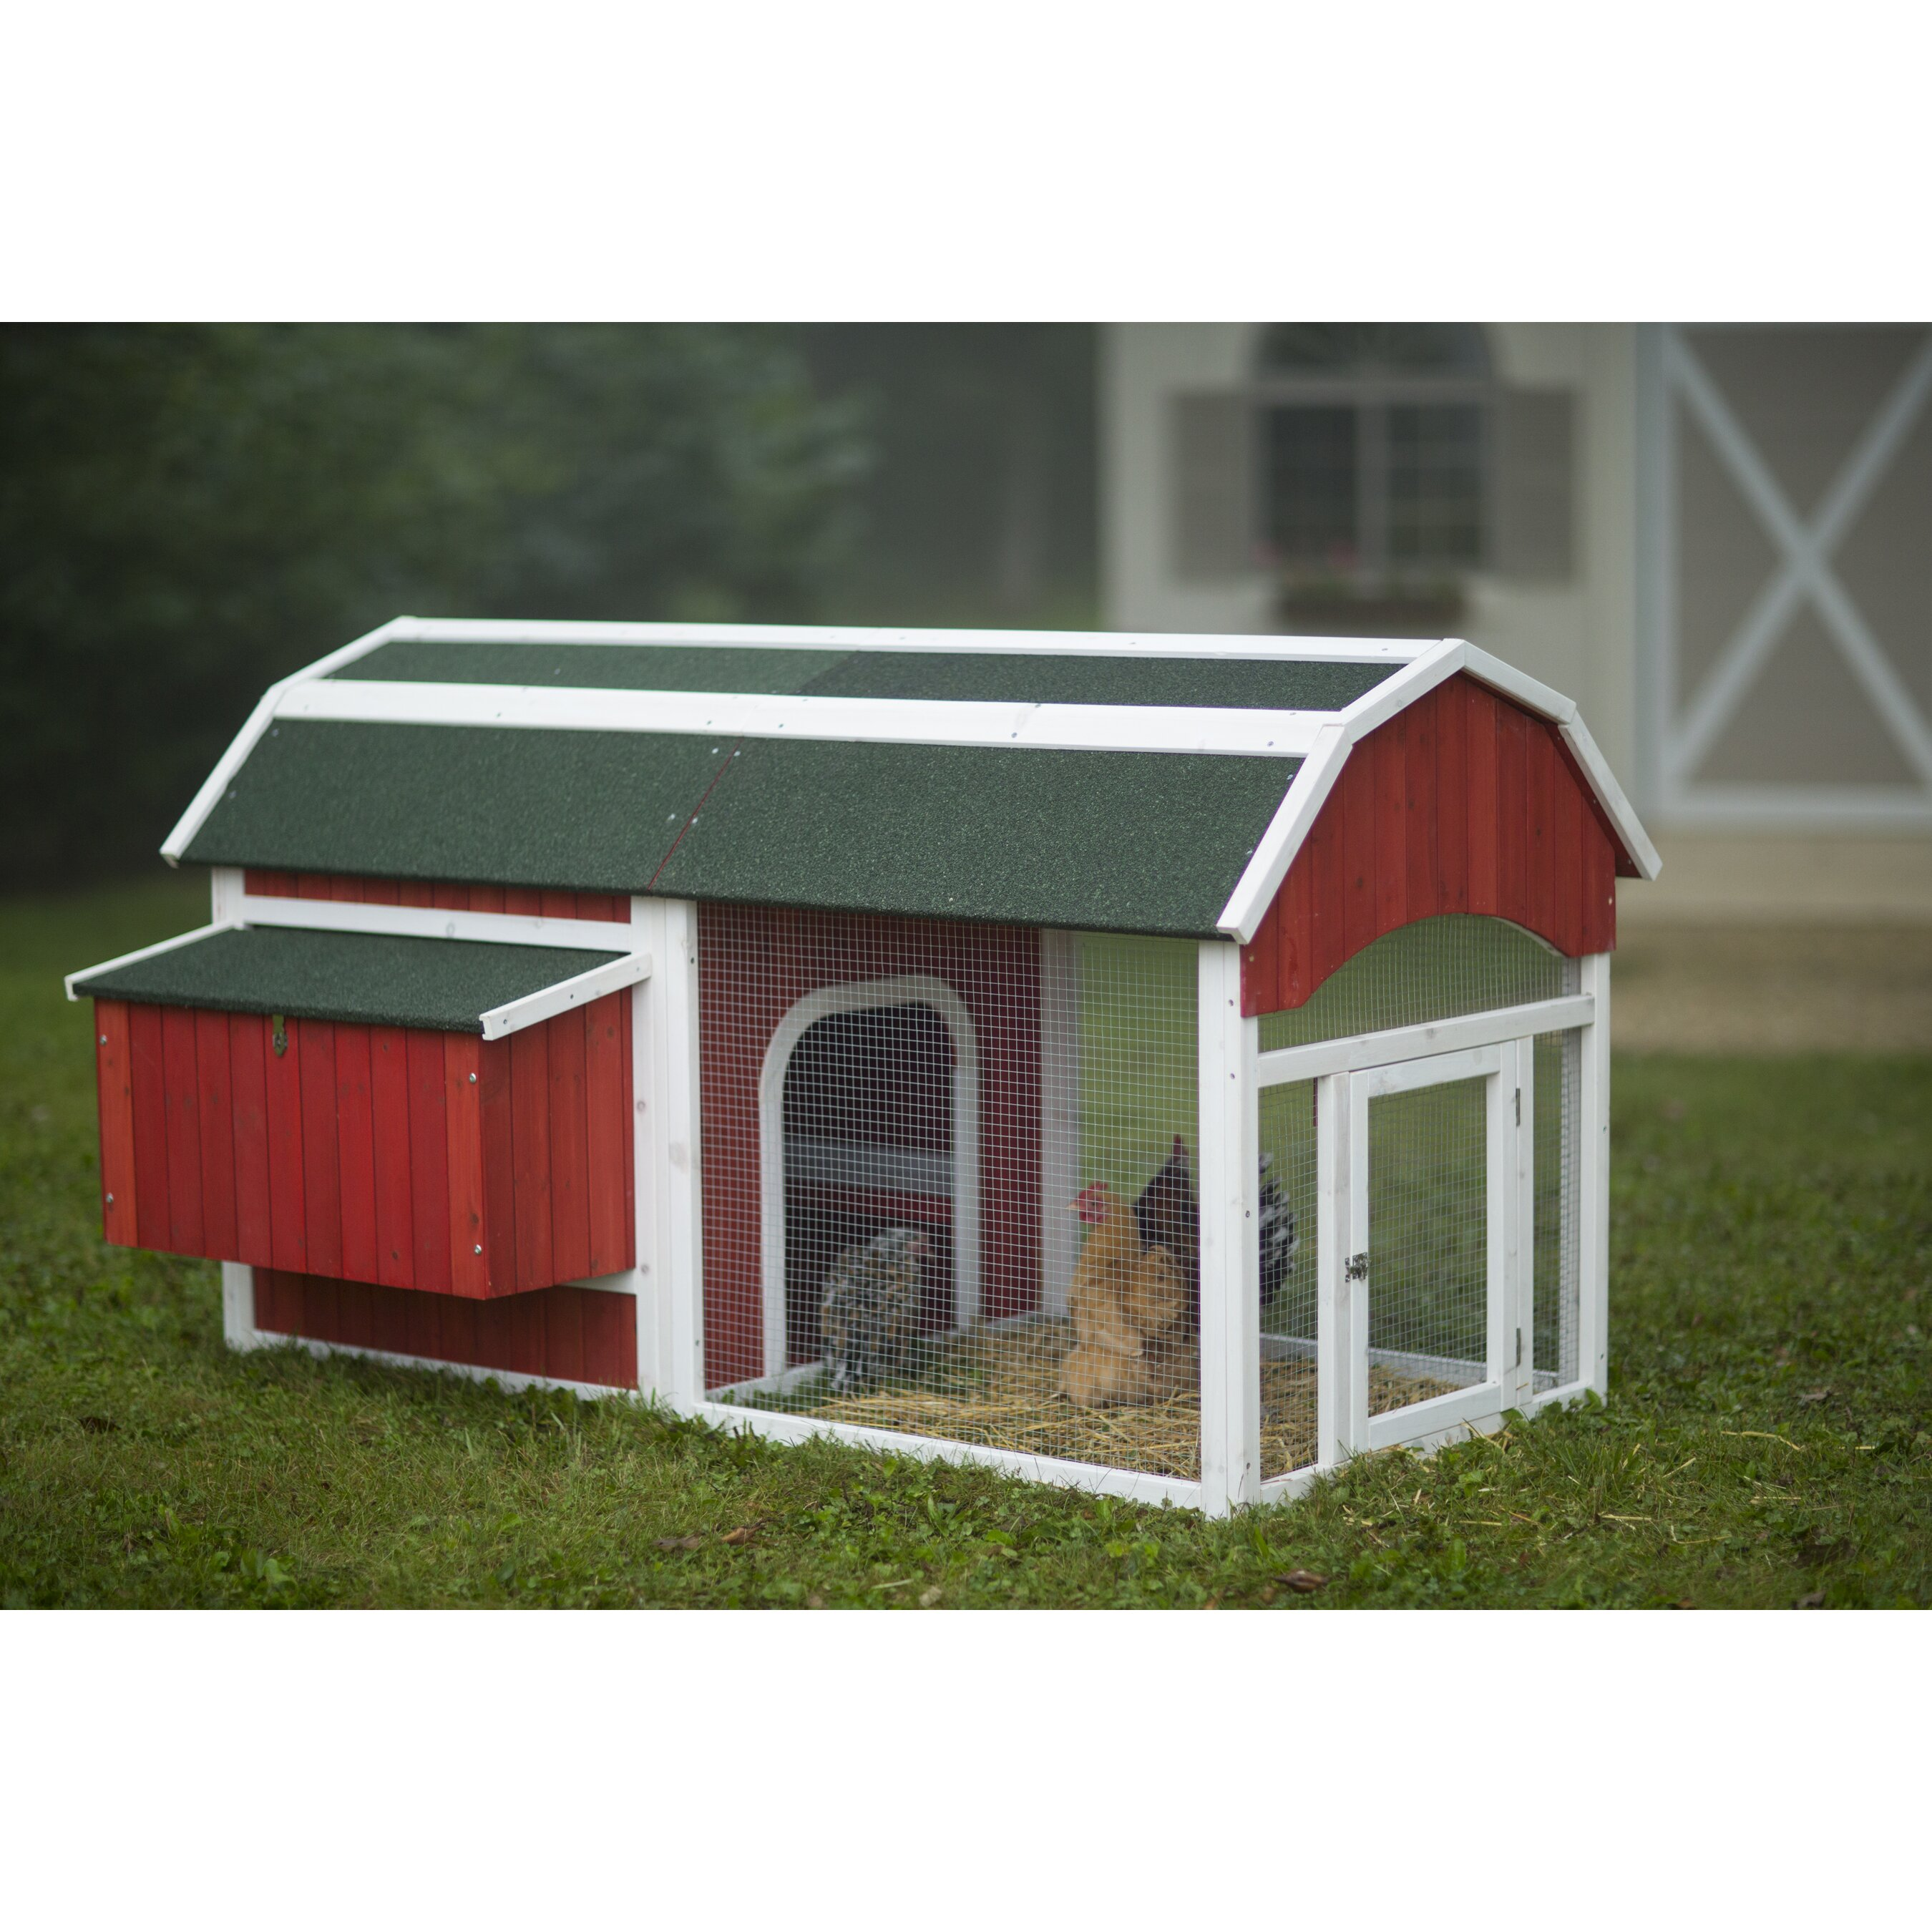 Prevue Hendryx Red Barn Small Chicken Coop Amp Reviews Wayfair